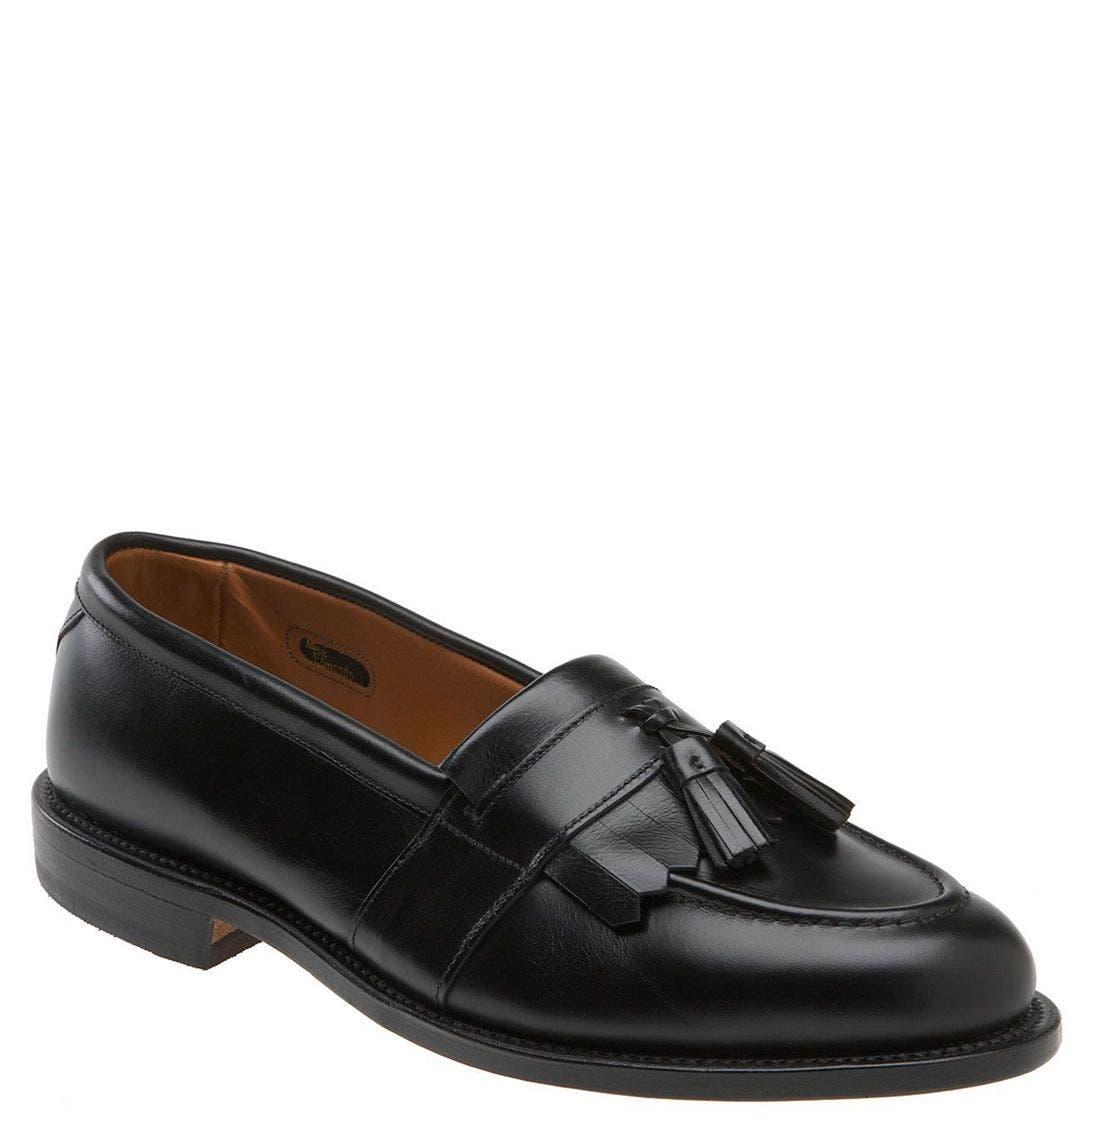 ALLEN EDMONDS Allen-Edmonds 'Newport' Loafer, Main, color, BLK